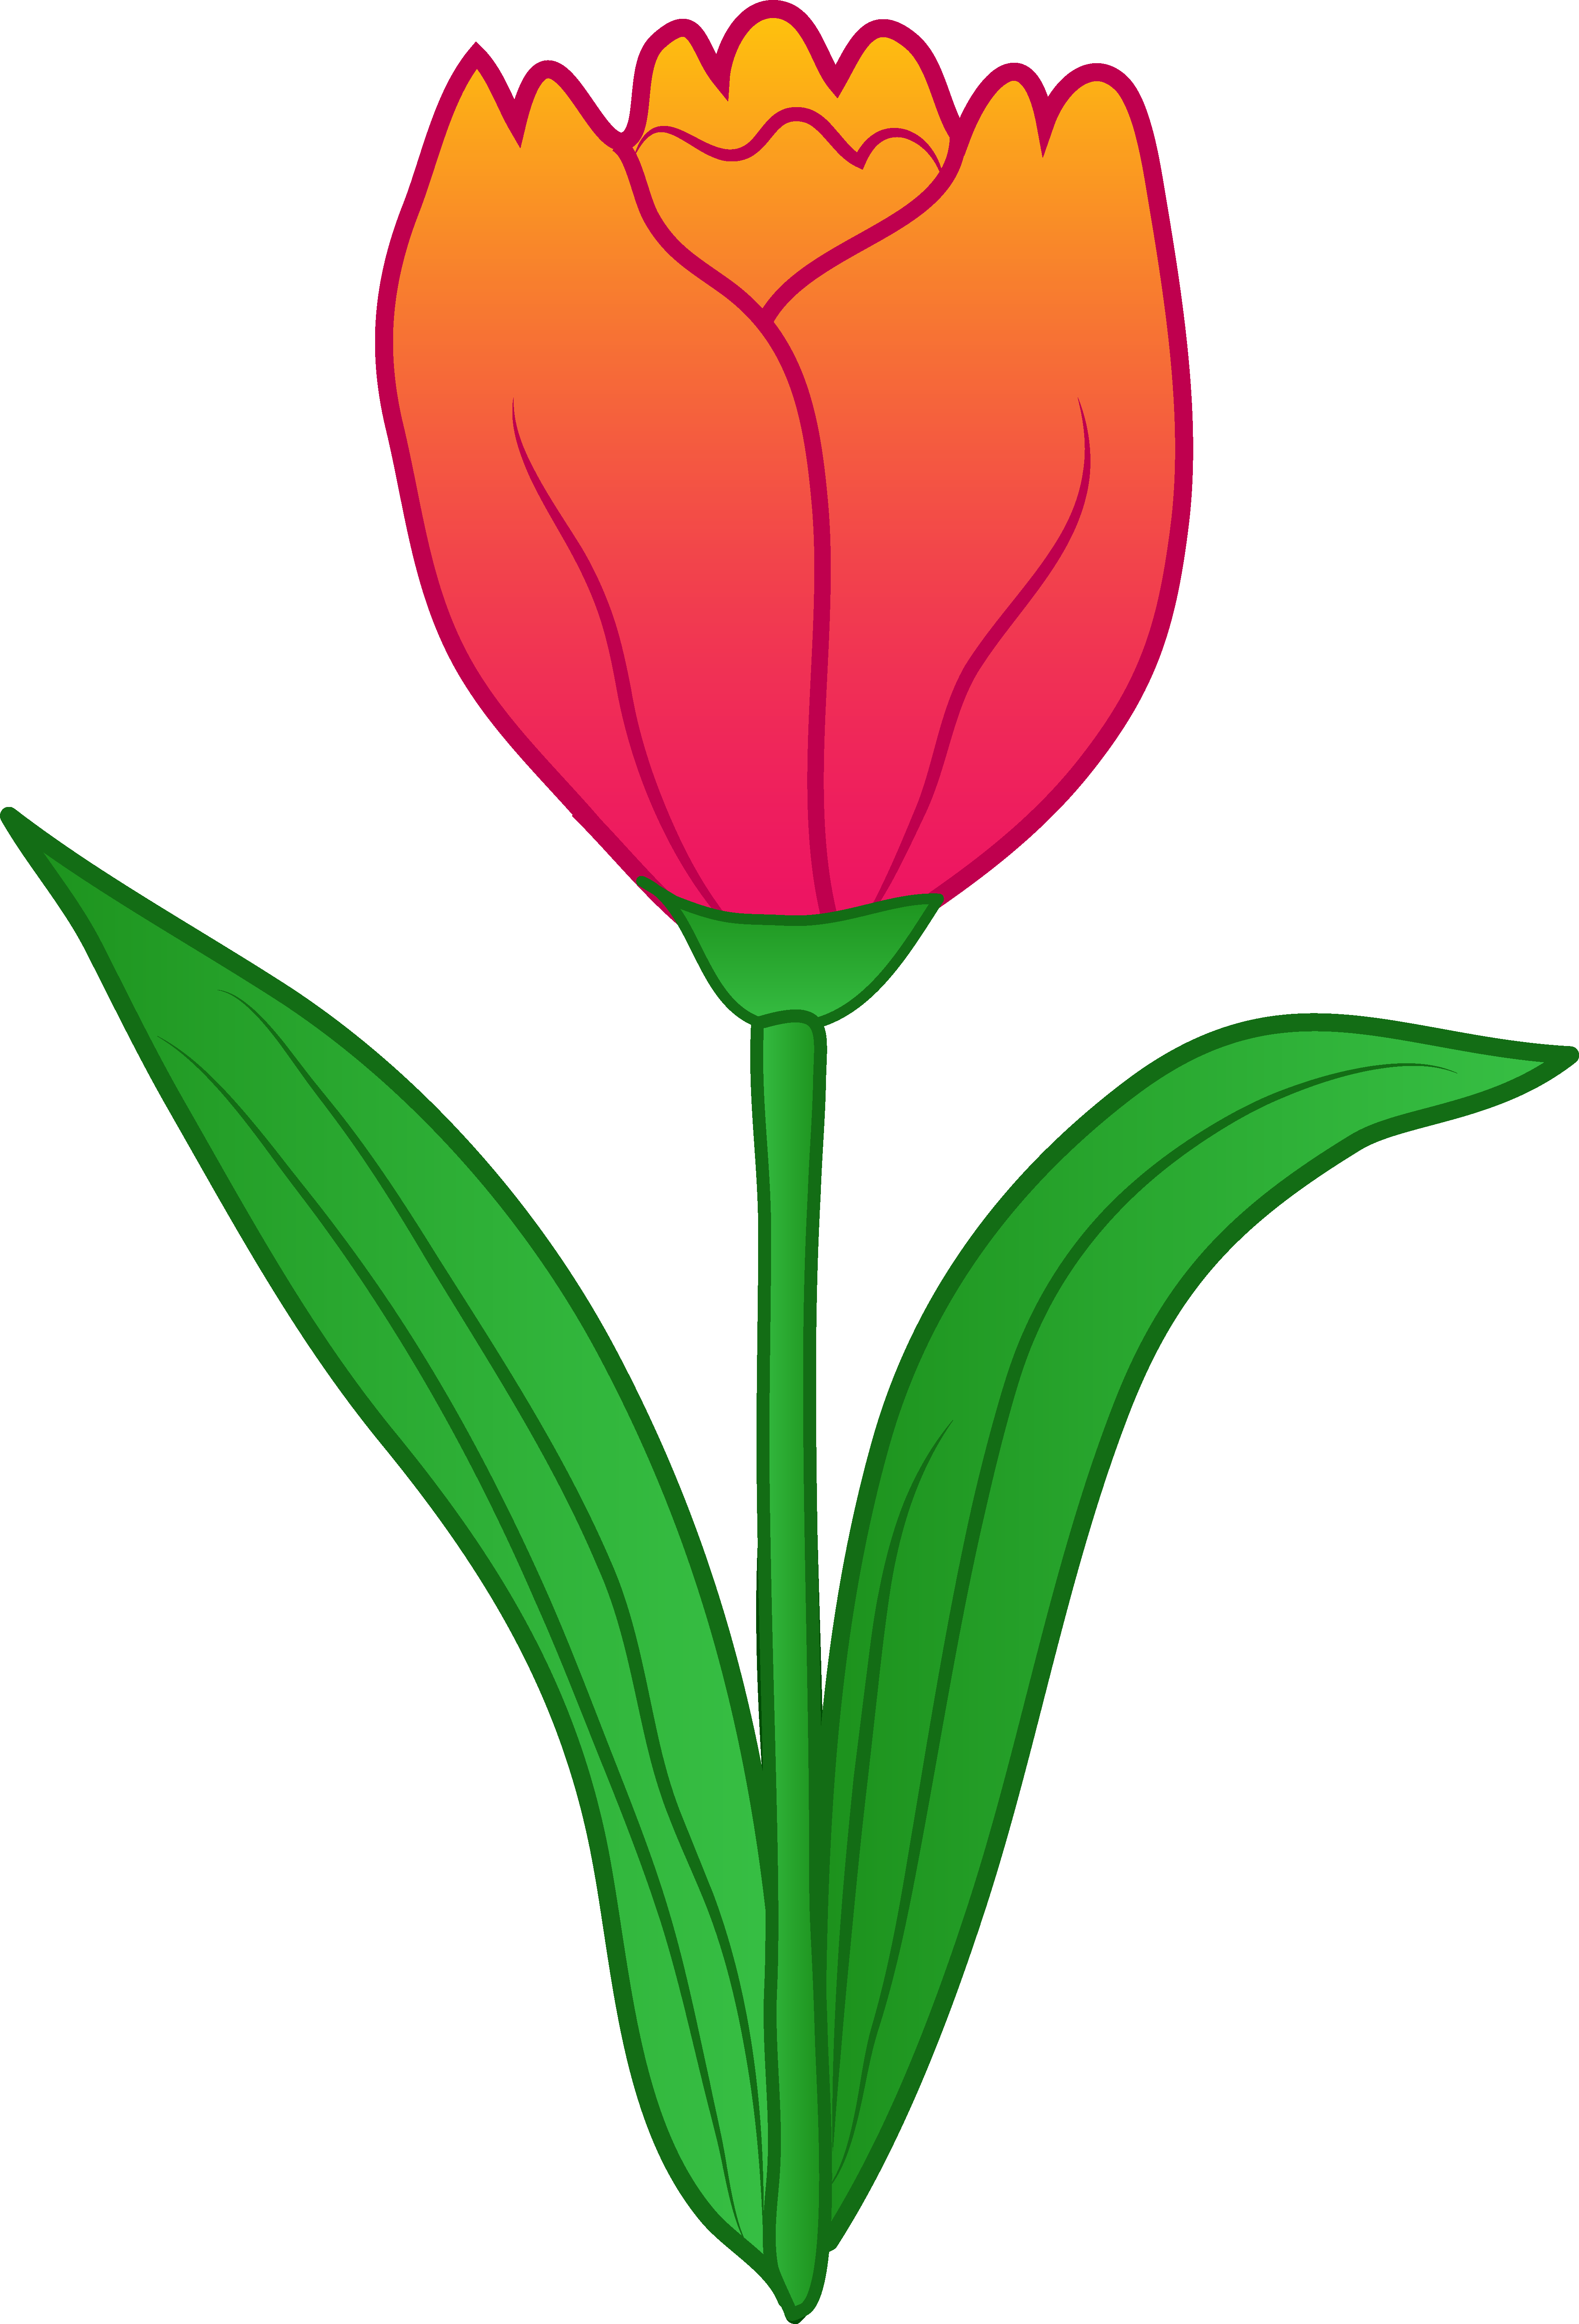 Pix For > Tulip Garden Clip Art